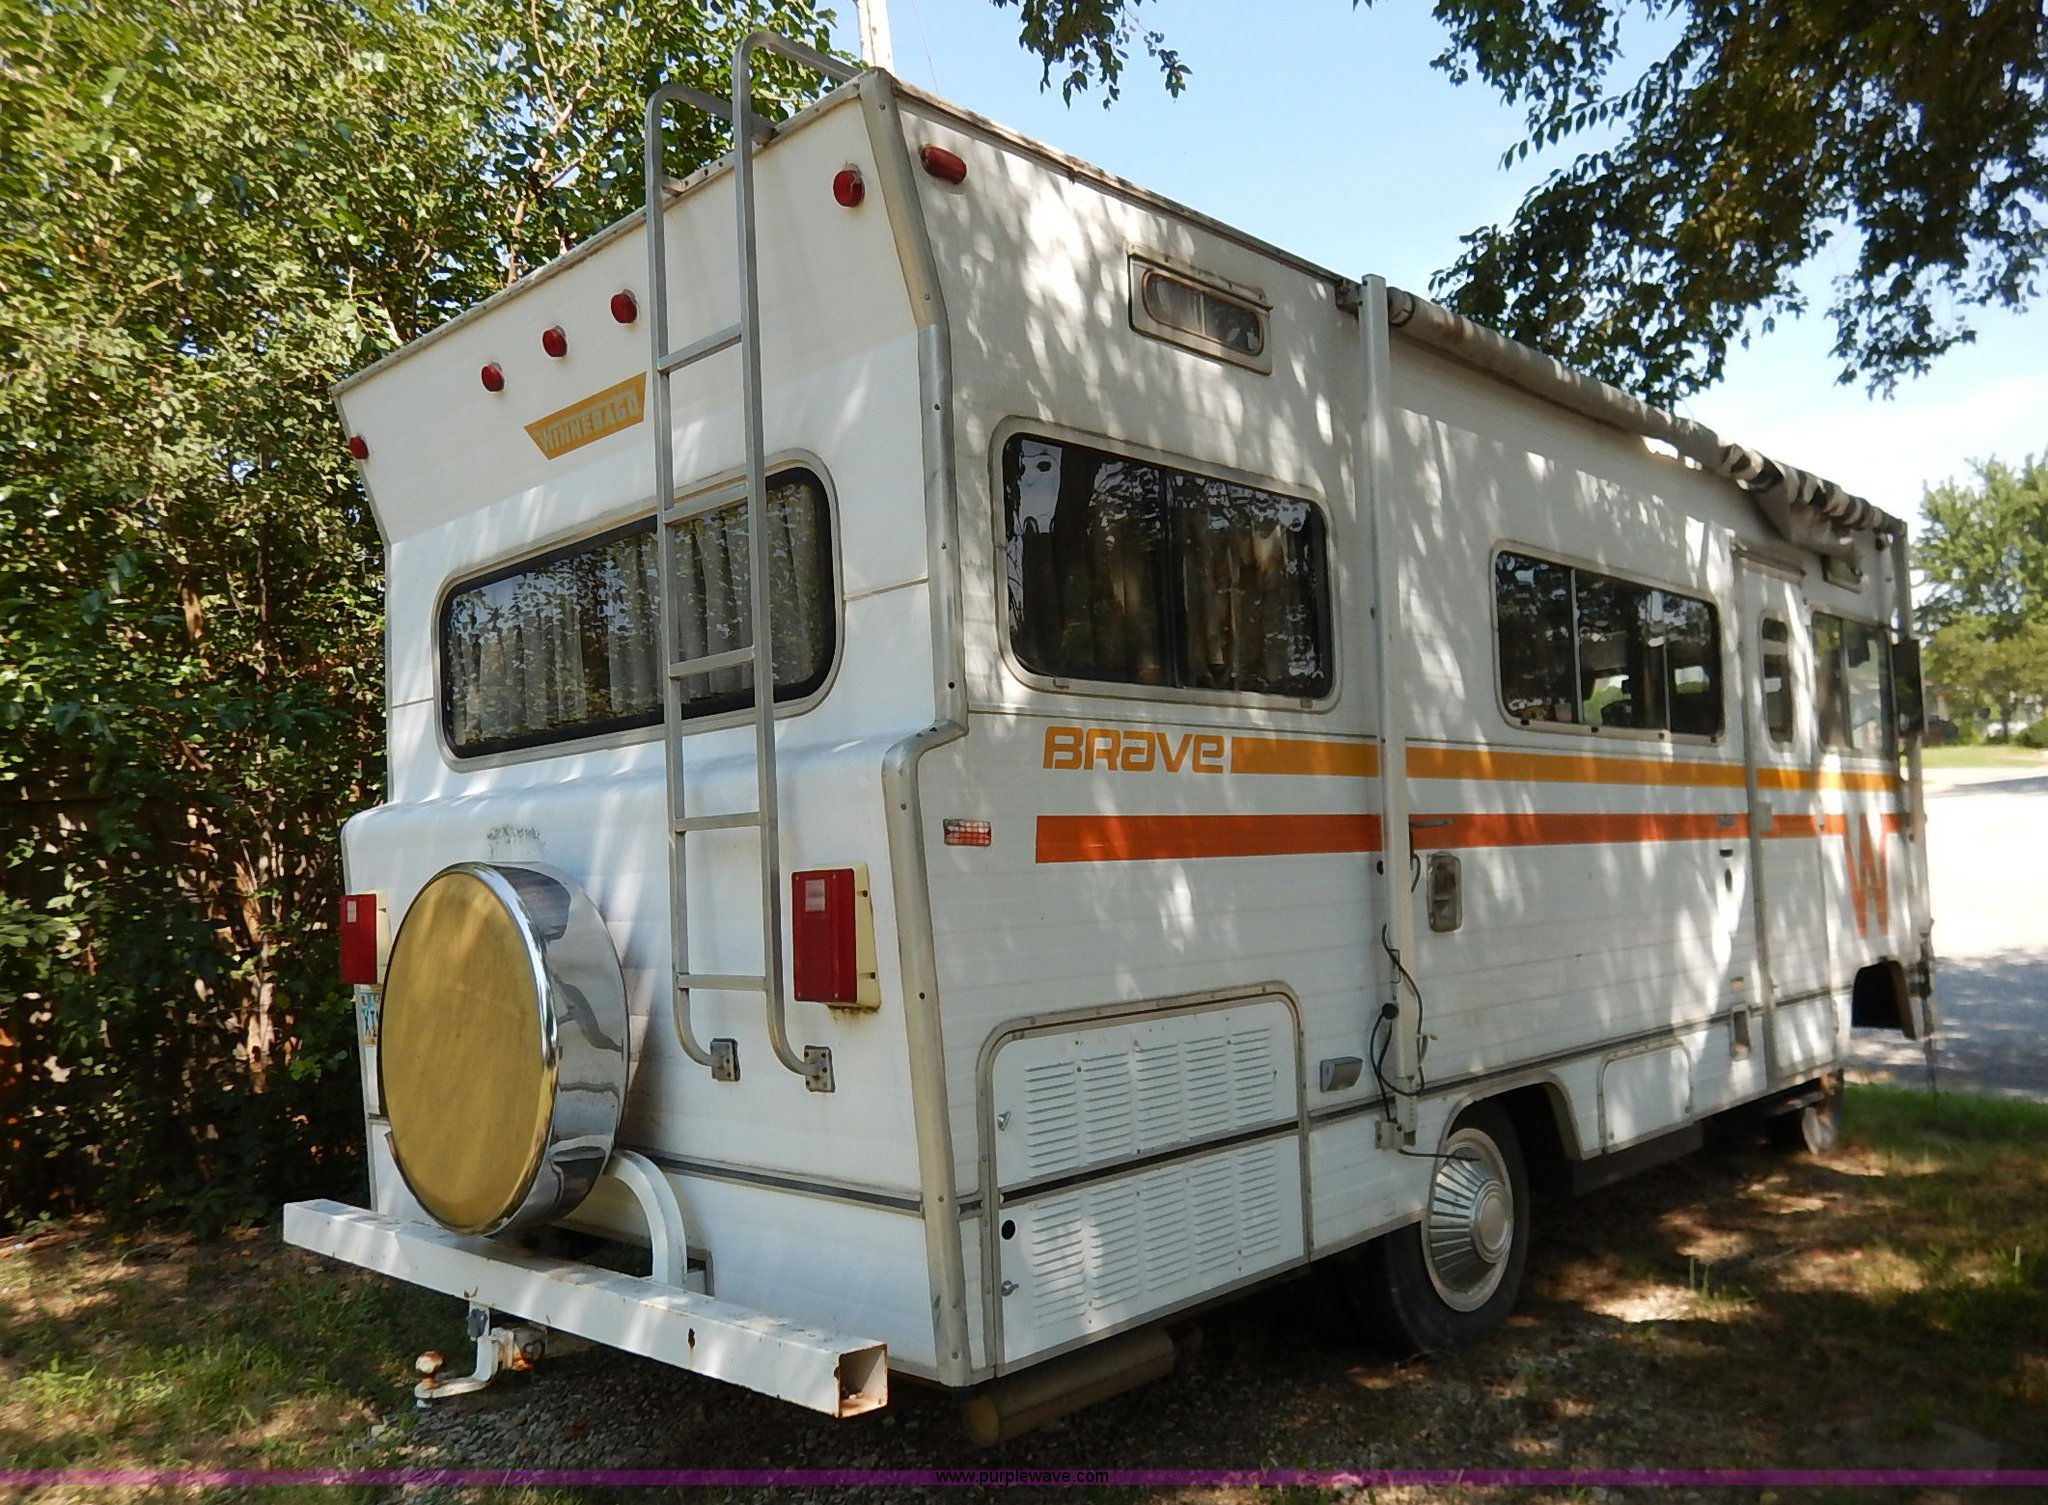 1974 Winnebago Brave RV | Item K1519 | SOLD! August 12 Vehic